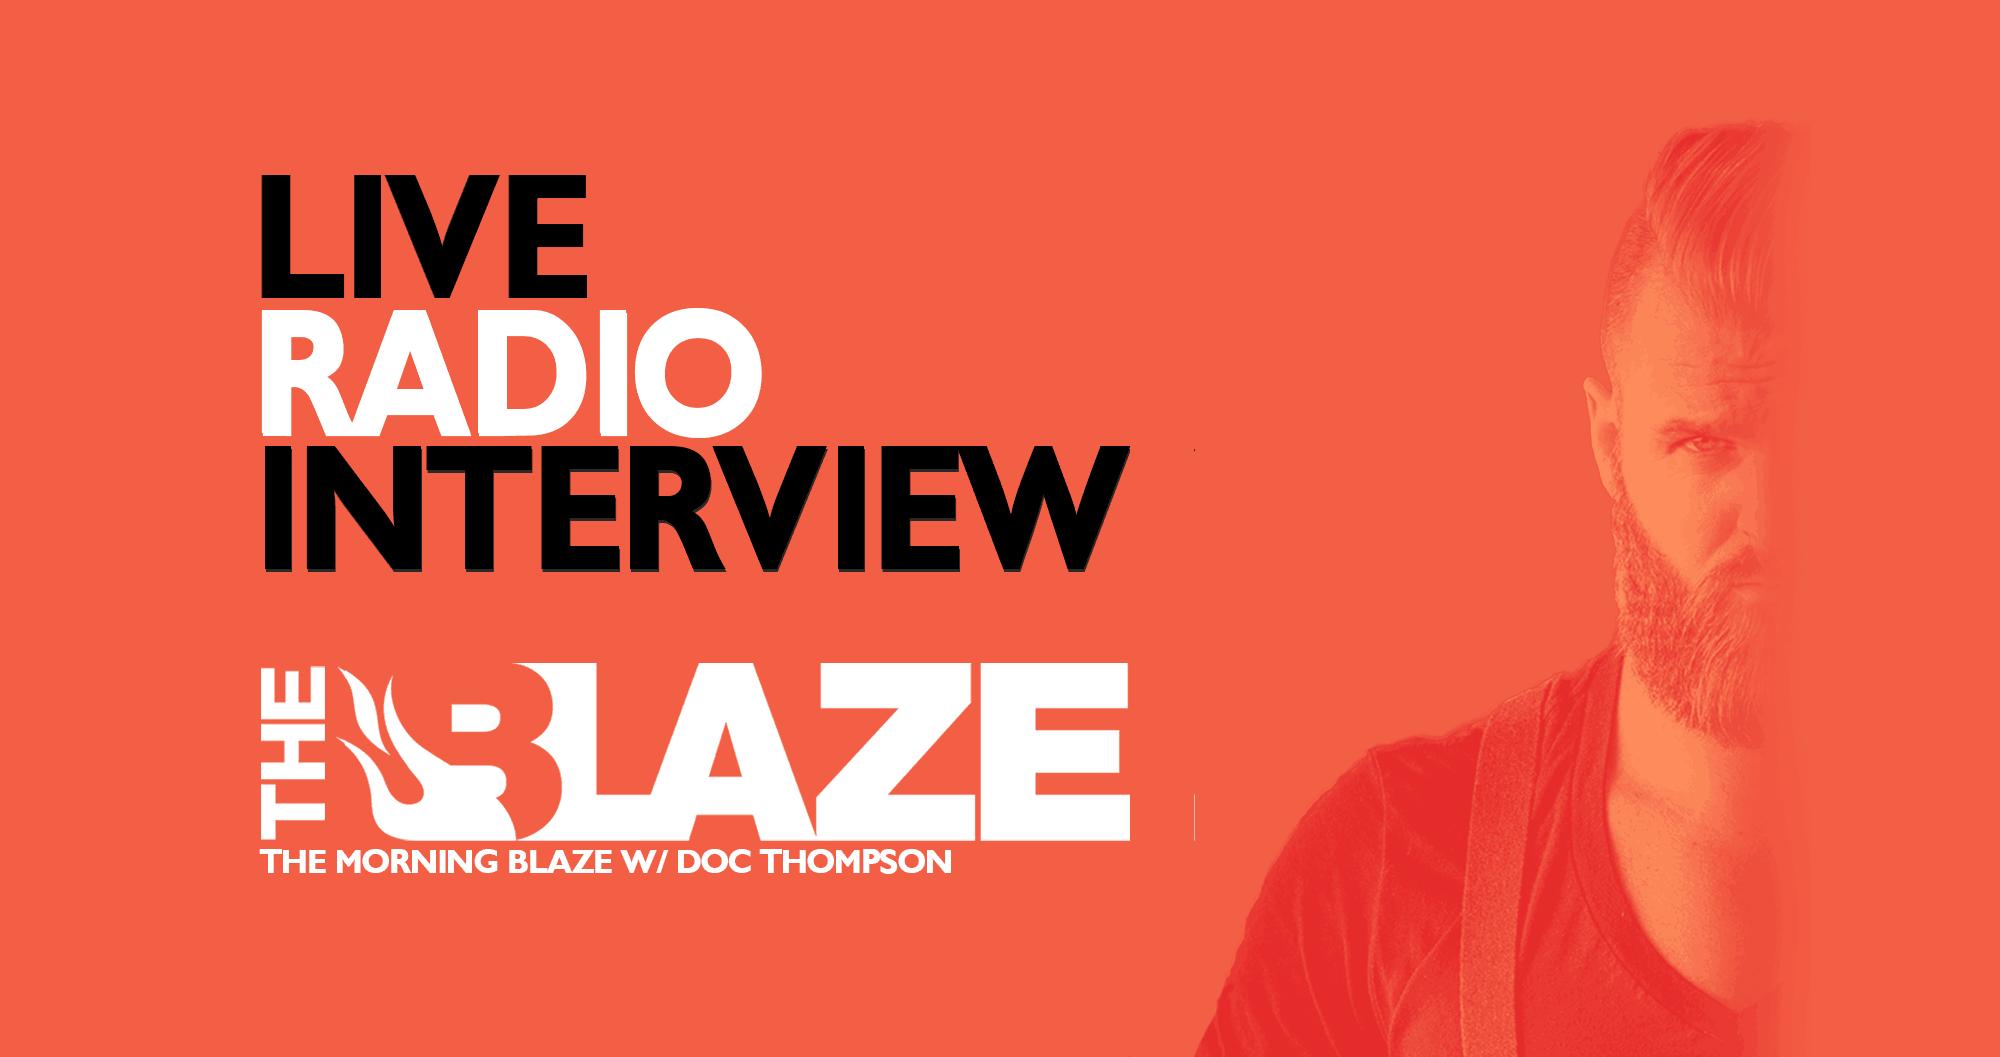 My Live Radio Interview On The Morning Blaze #BUILDINGAMERICA